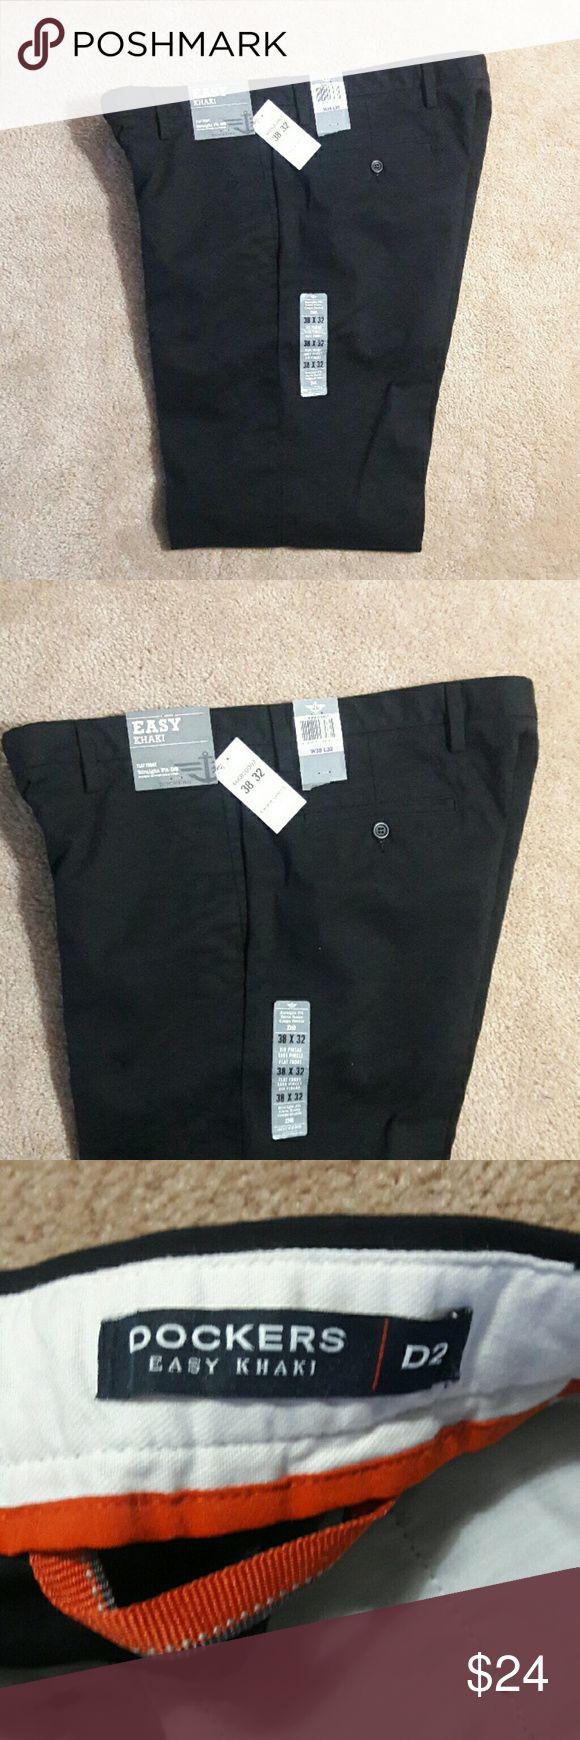 Dockers Easy Khaki D2 Mens Pant 38 X 32 Black Dockers Easy Khaki D2 Mens Pant   Size - 38 X 32   Color - Black  Straight Fit, Flat Front Dockers Pants Chinos & Khakis